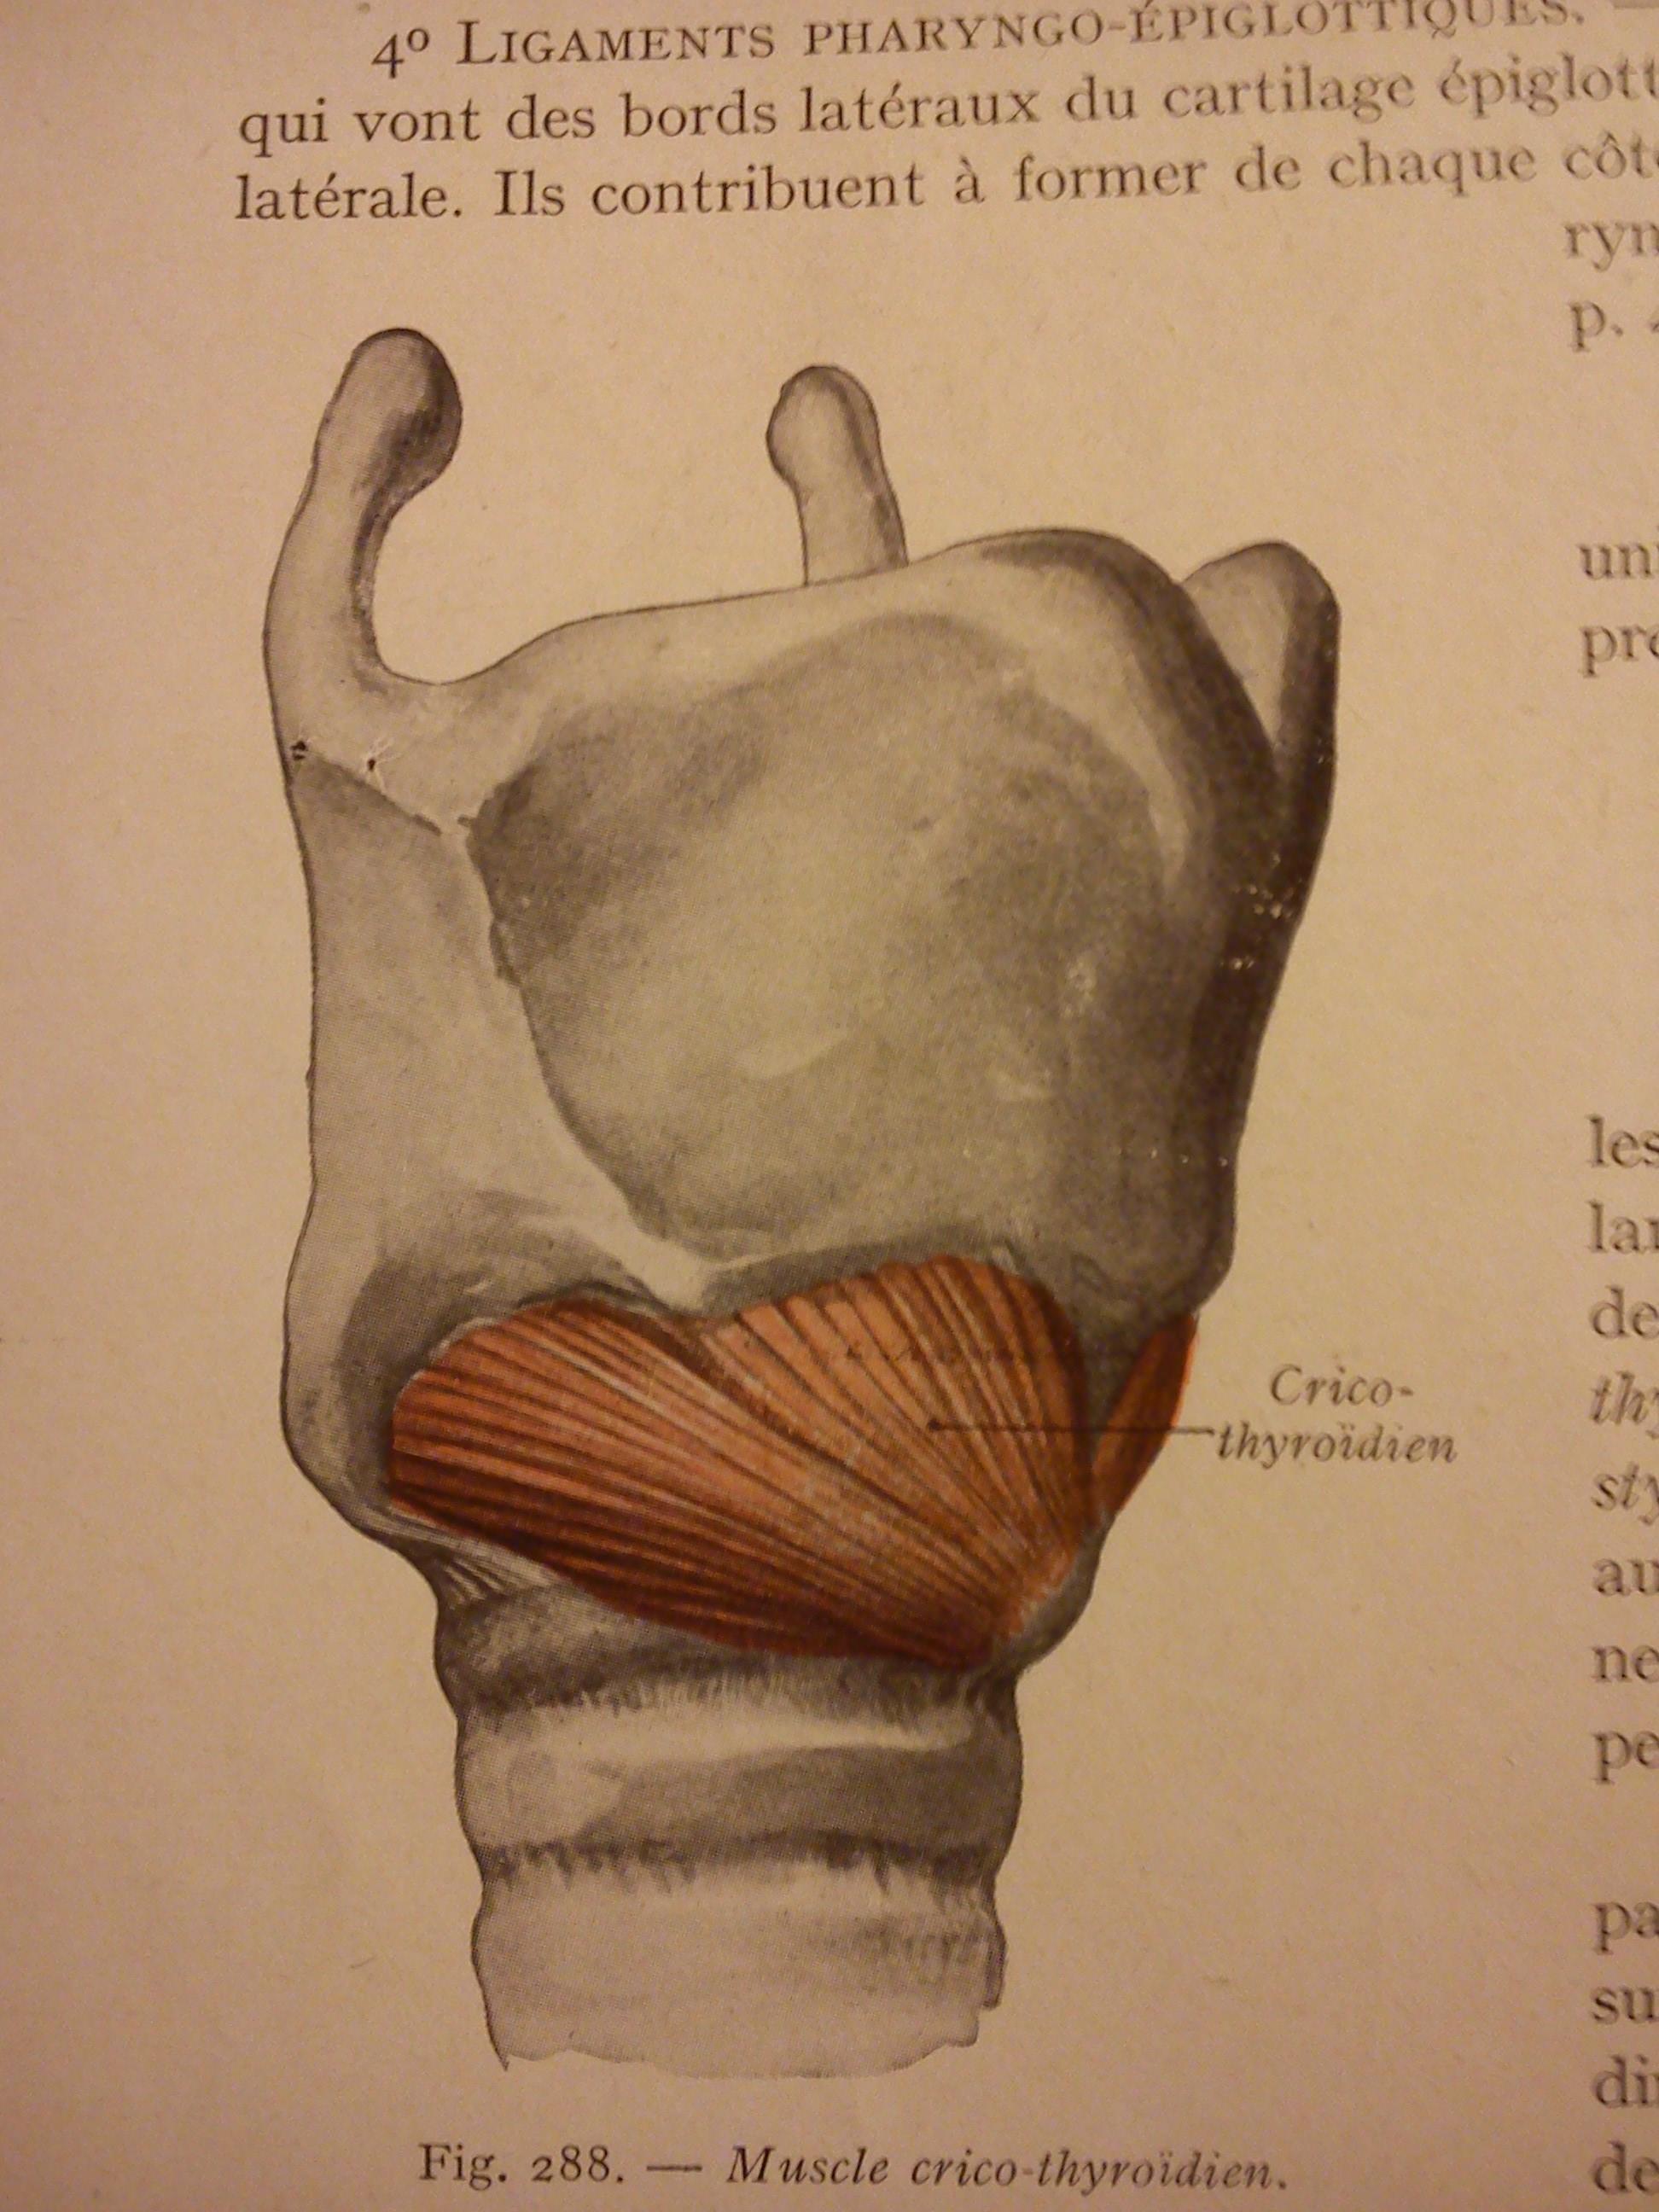 Anatomie du larynx